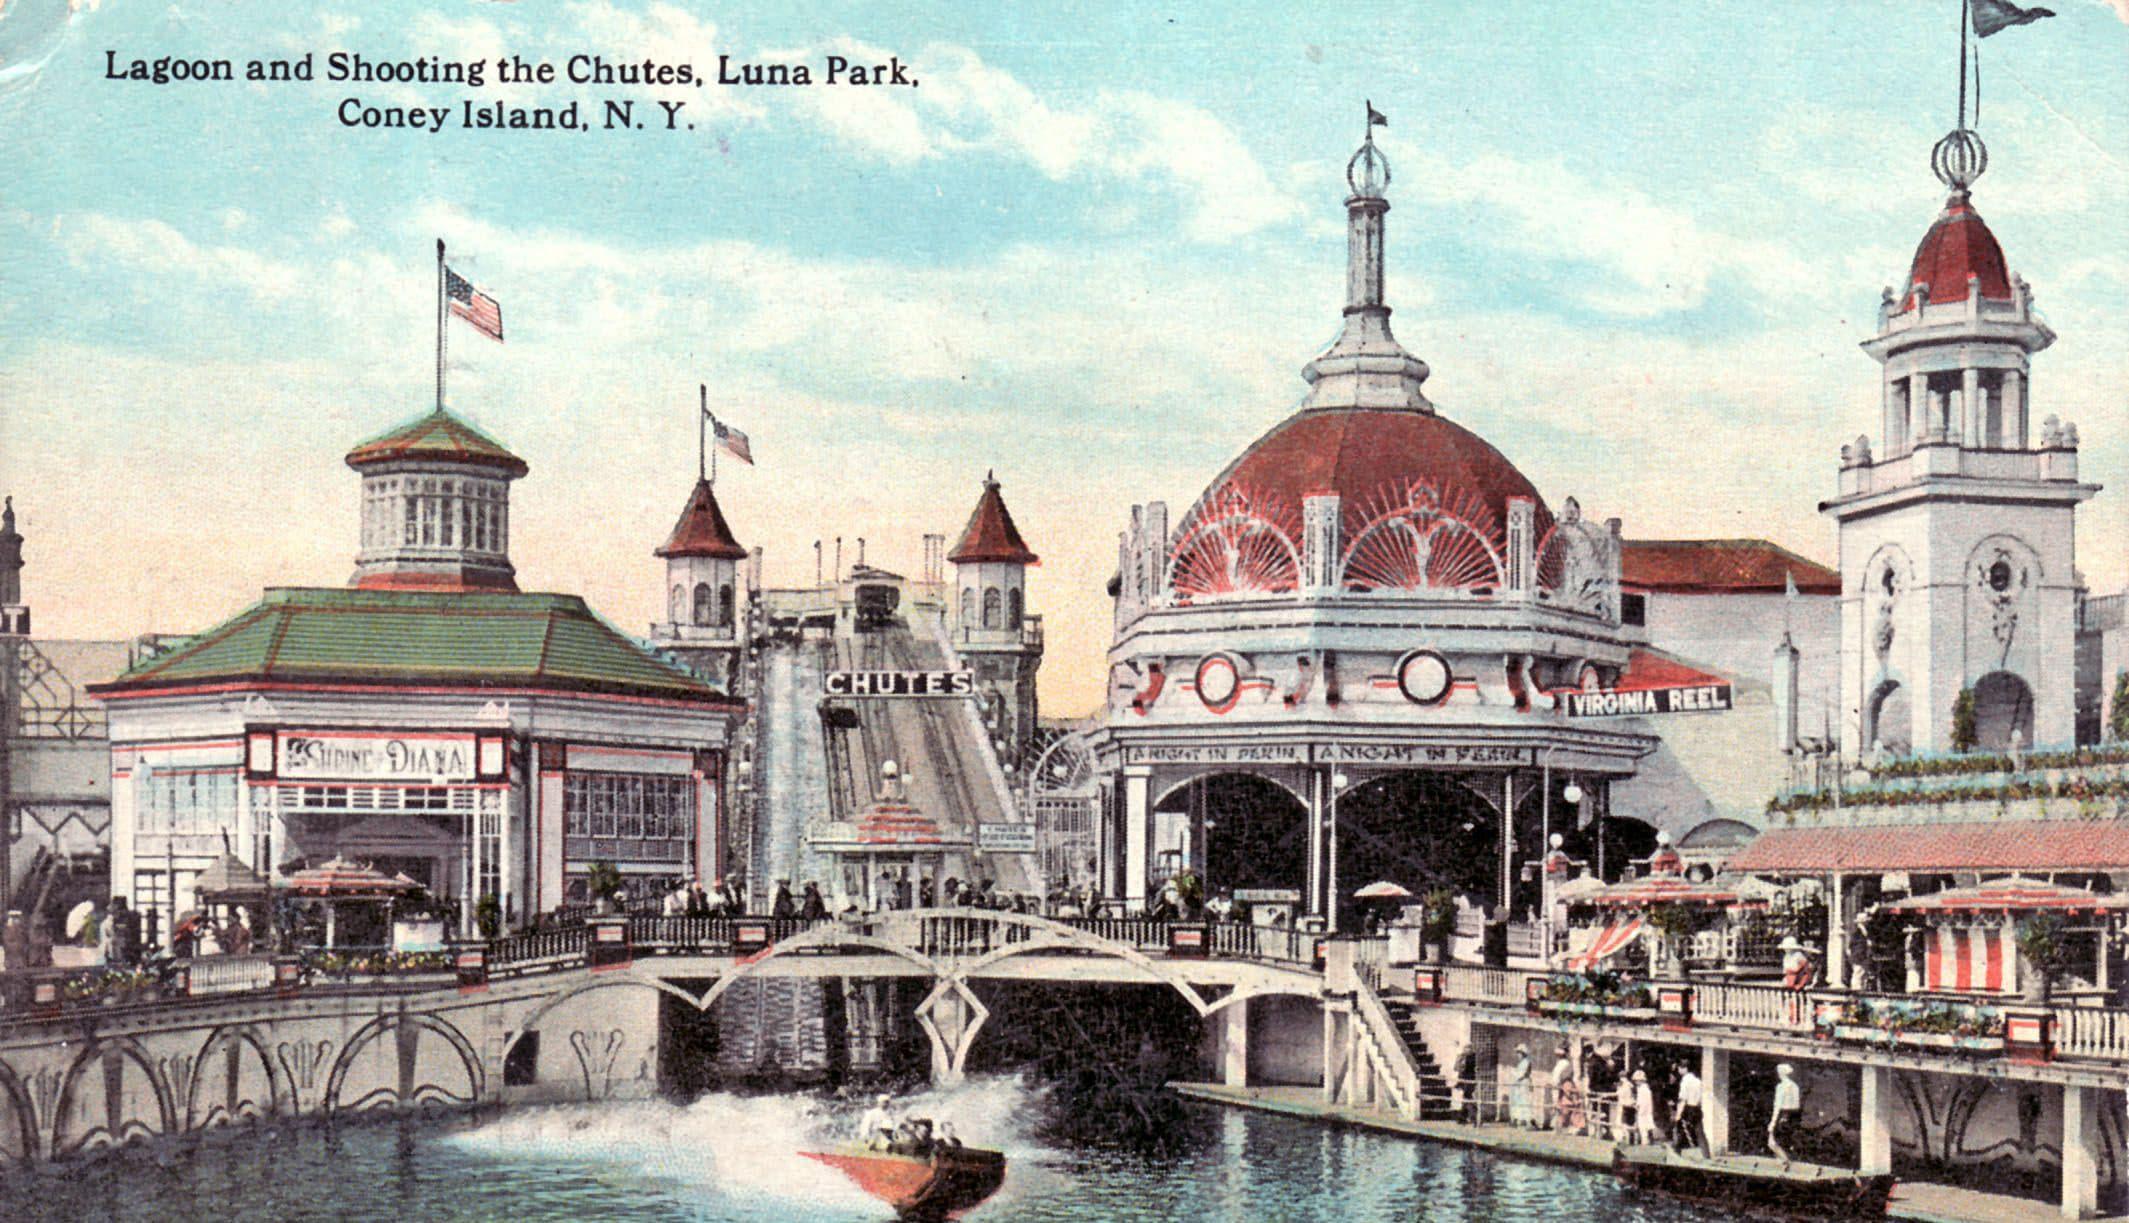 Lagoon and Shooting the Chutes, Luna Park, Coney Island, New York